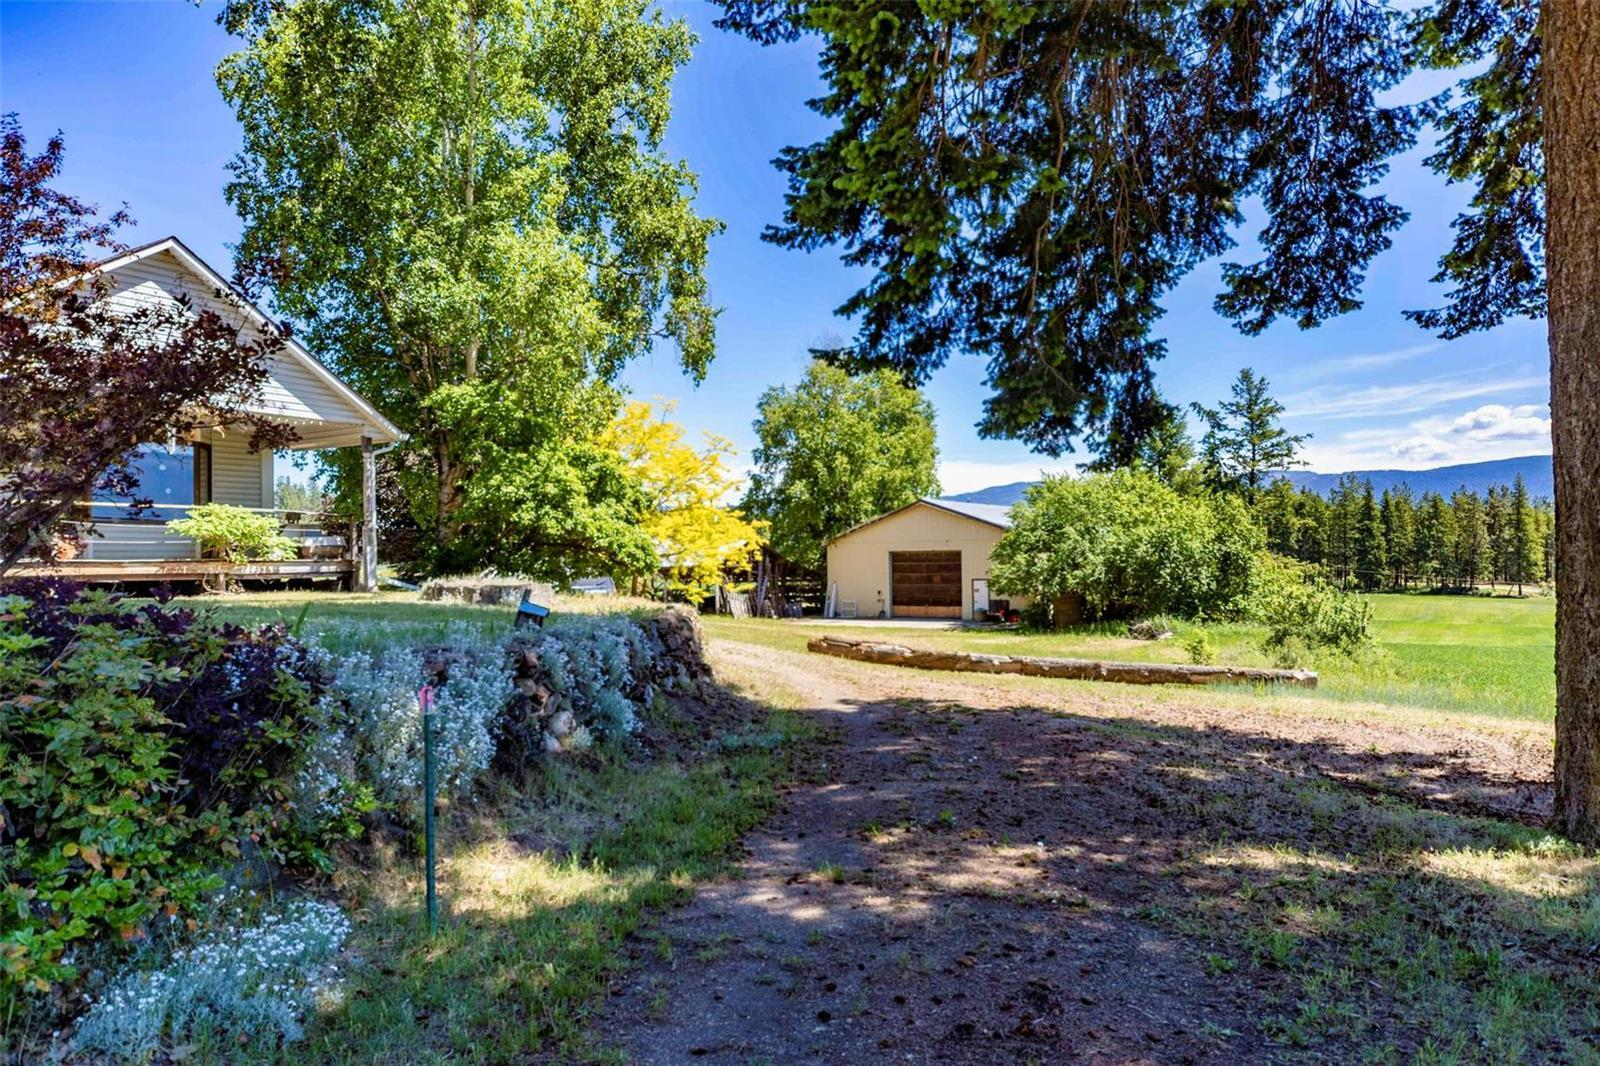 4602 Schubert Road,, Armstrong, British Columbia  V0E 1B4 - Photo 8 - 10232684